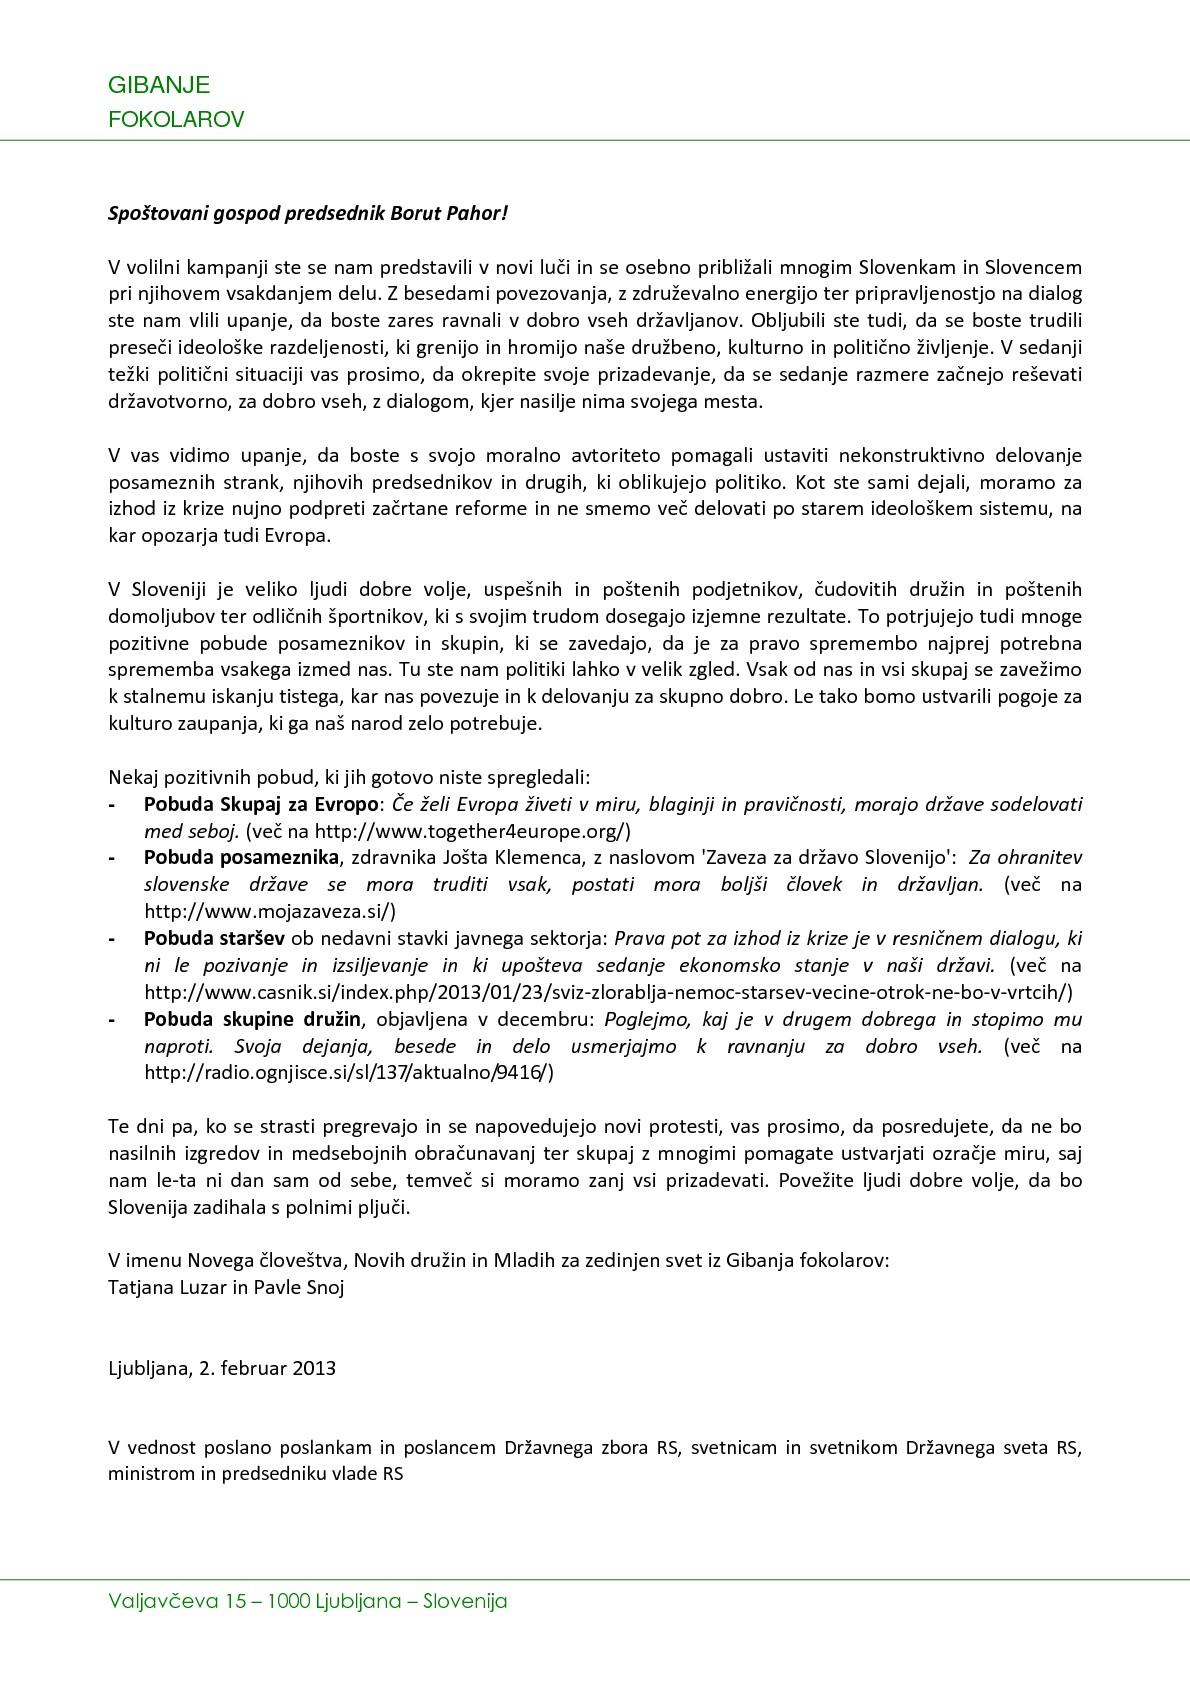 Pismo Pahor 2-2-2013